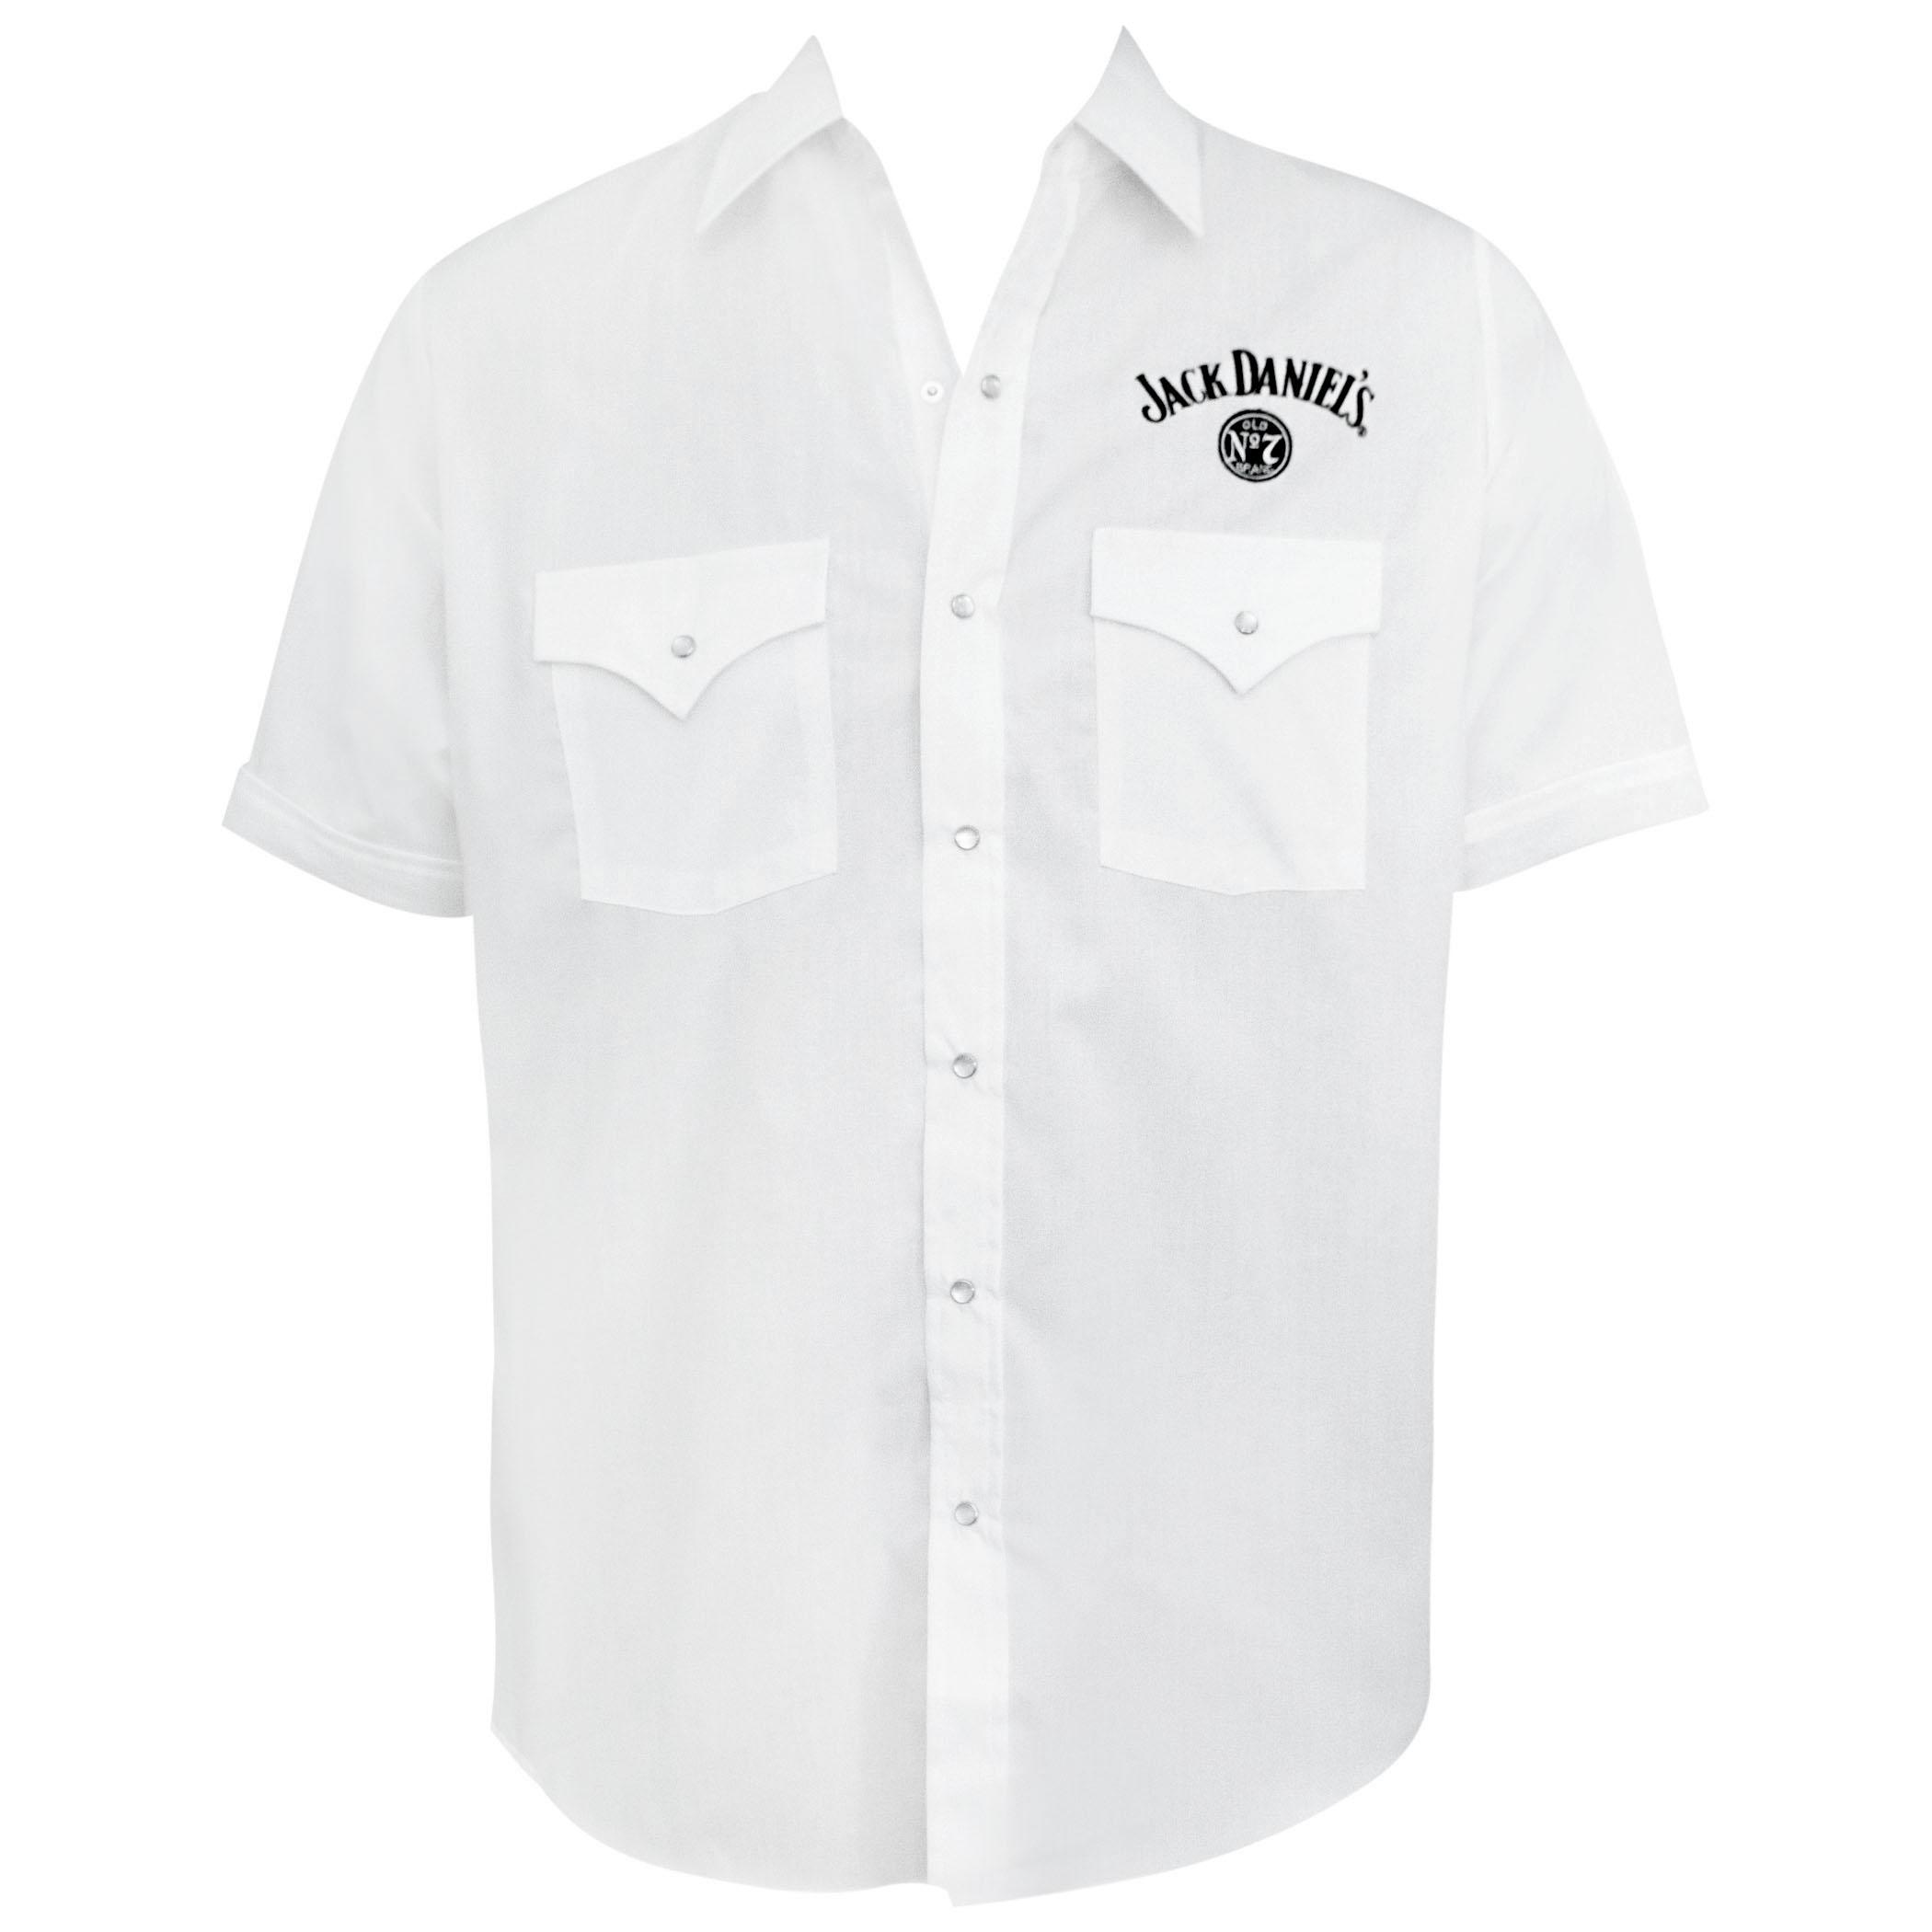 Jack Daniels White Short Sleeve Button Up